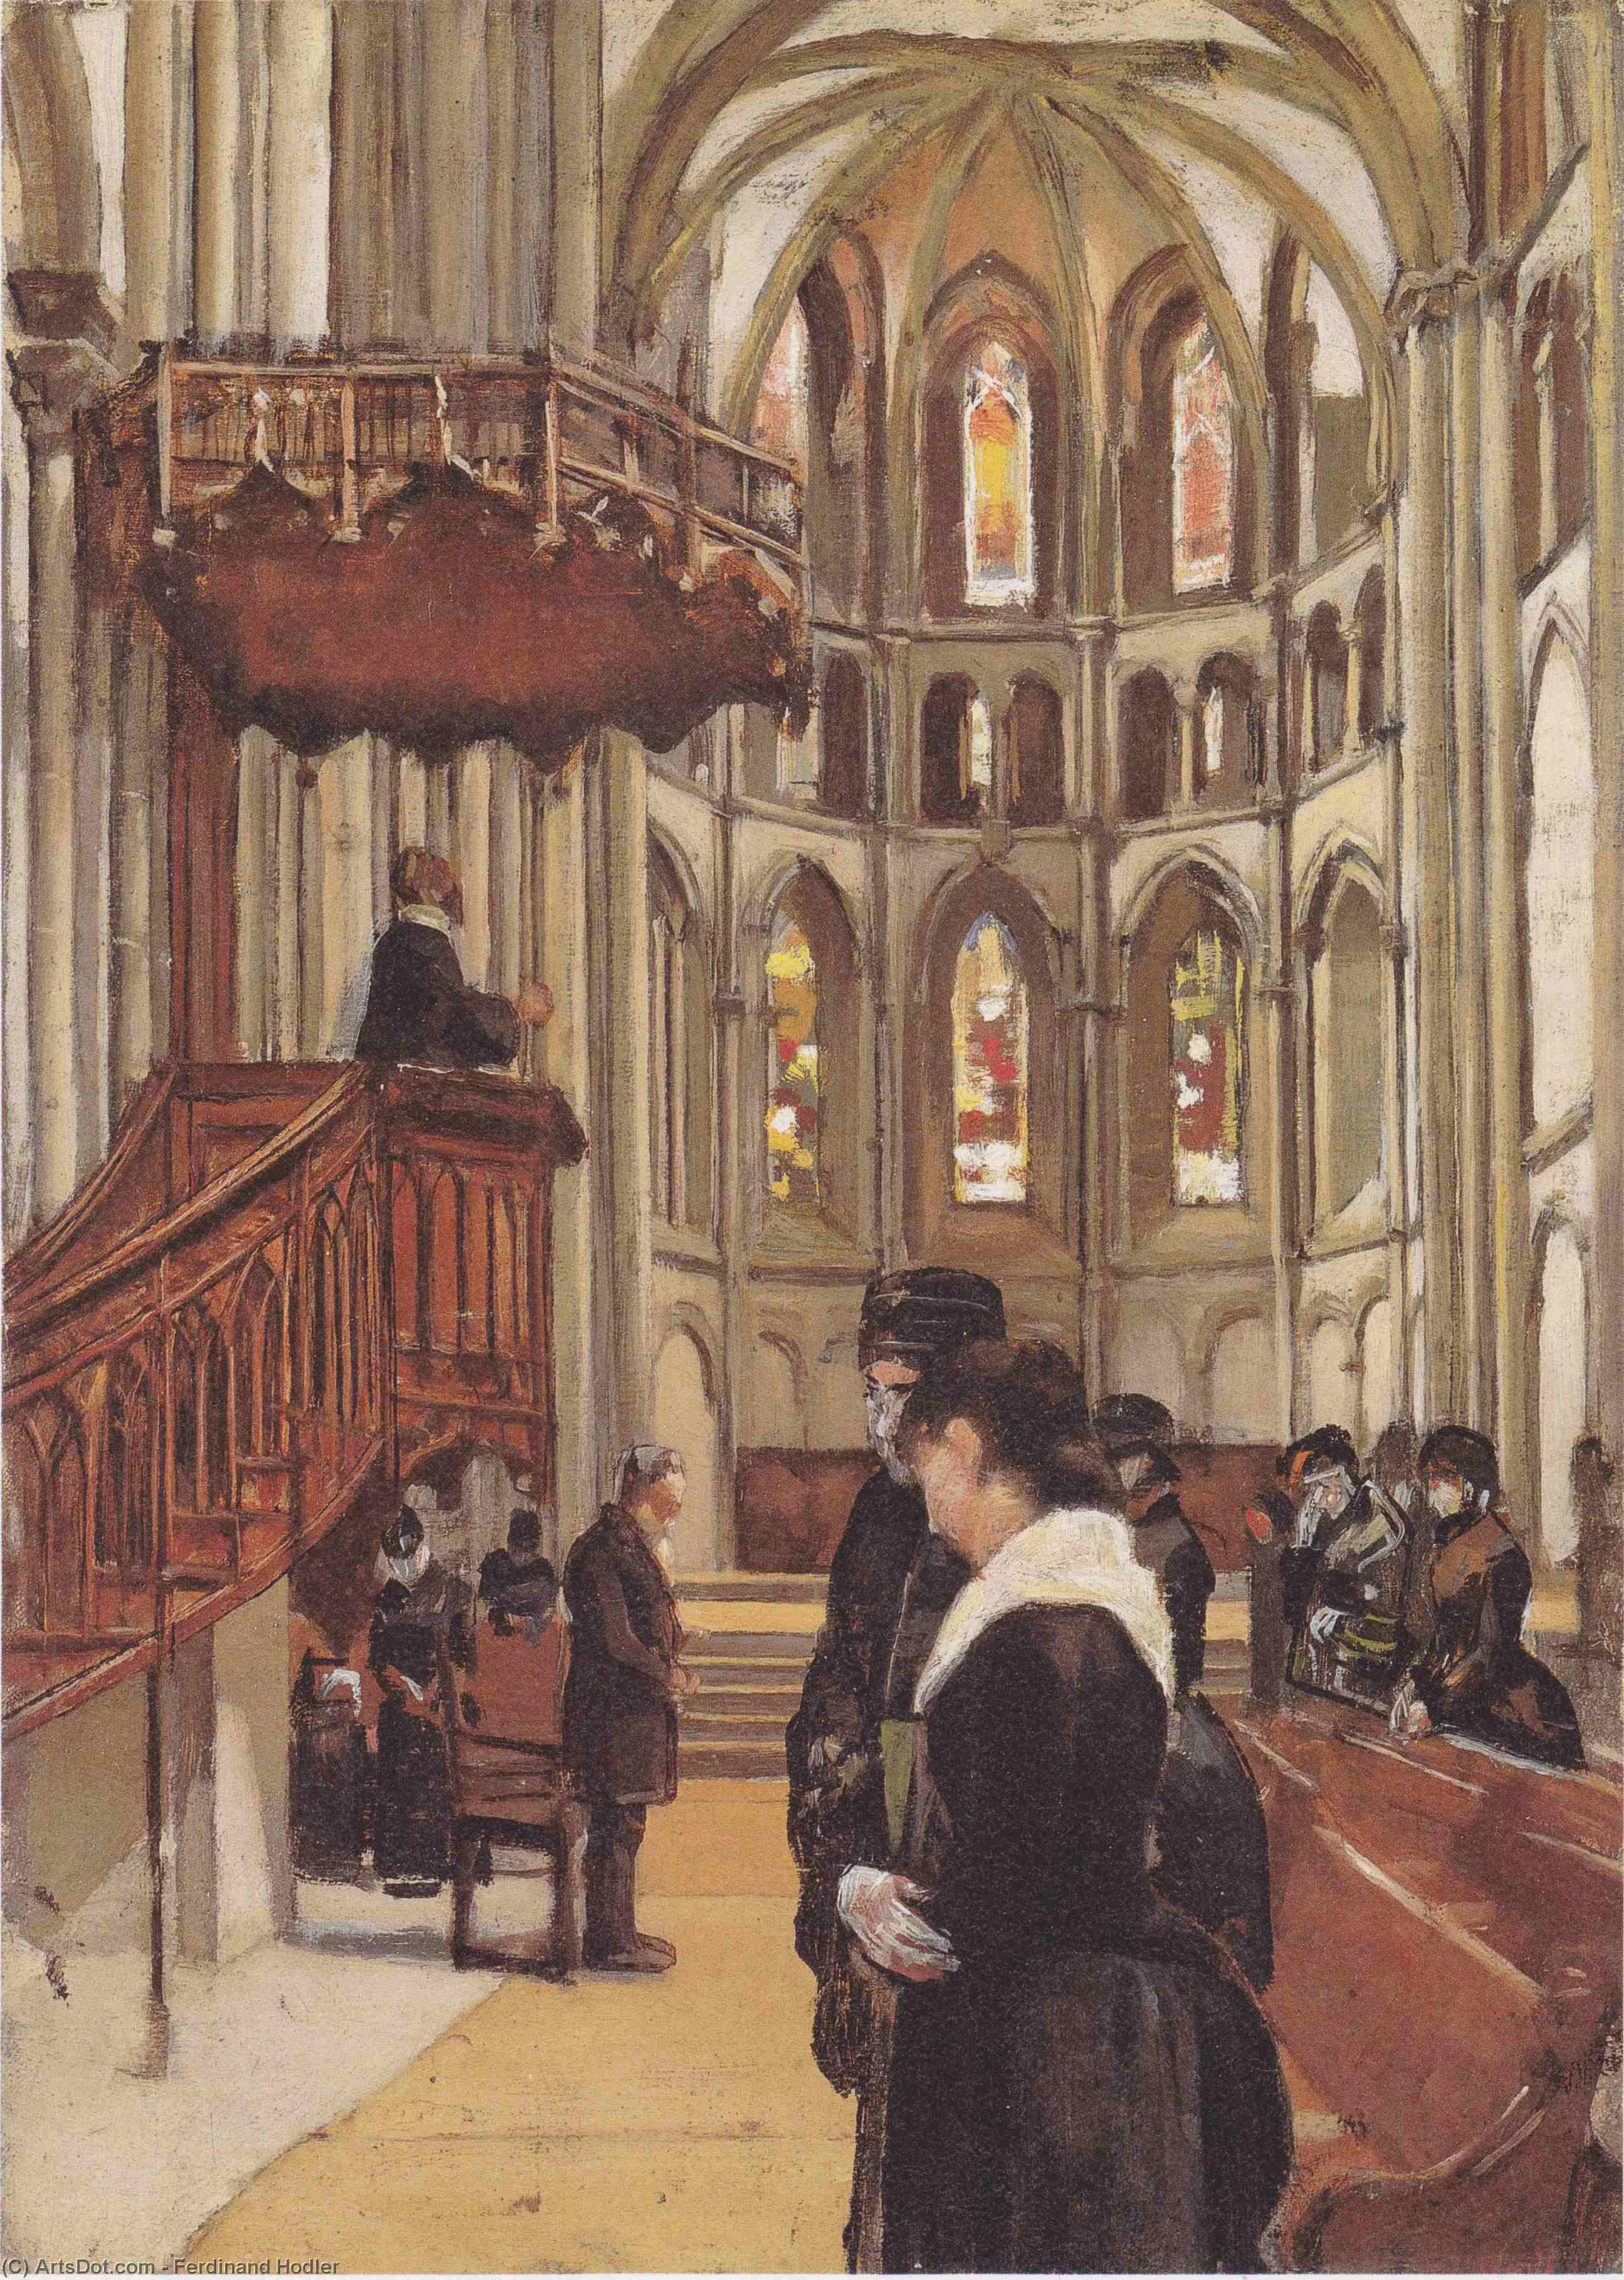 Фердинанд Ходлер Молитва в соборе Сен-Пьер в Женеве